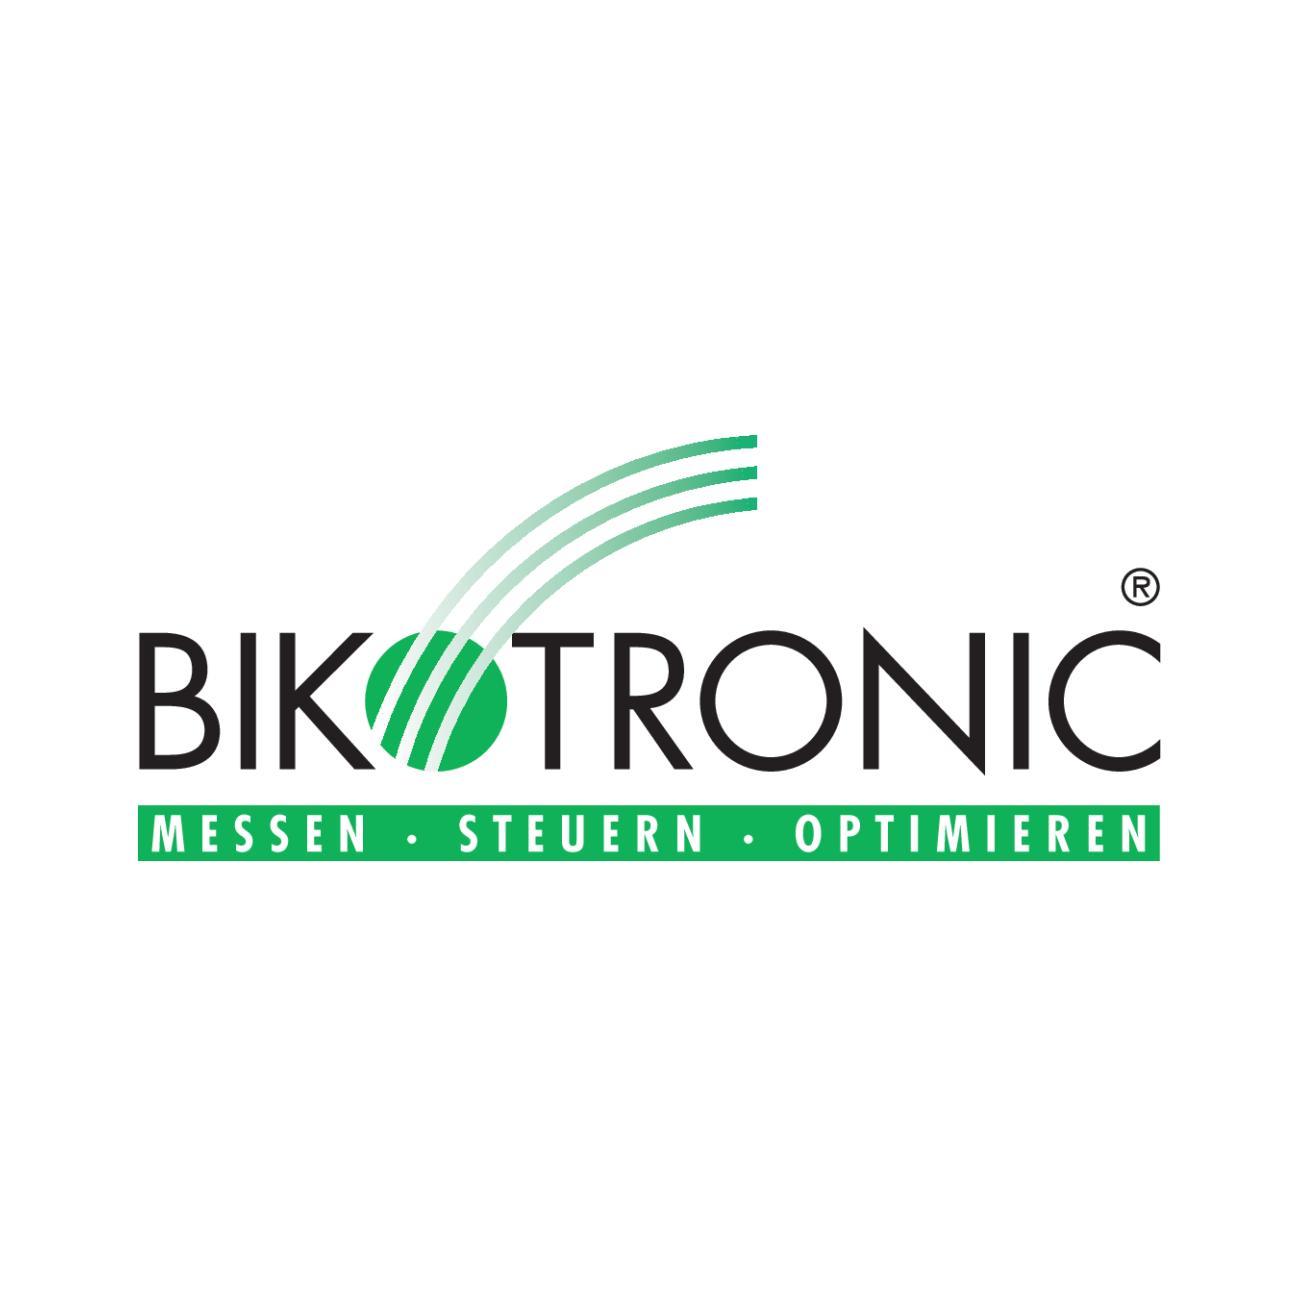 Bikotronic - Germany